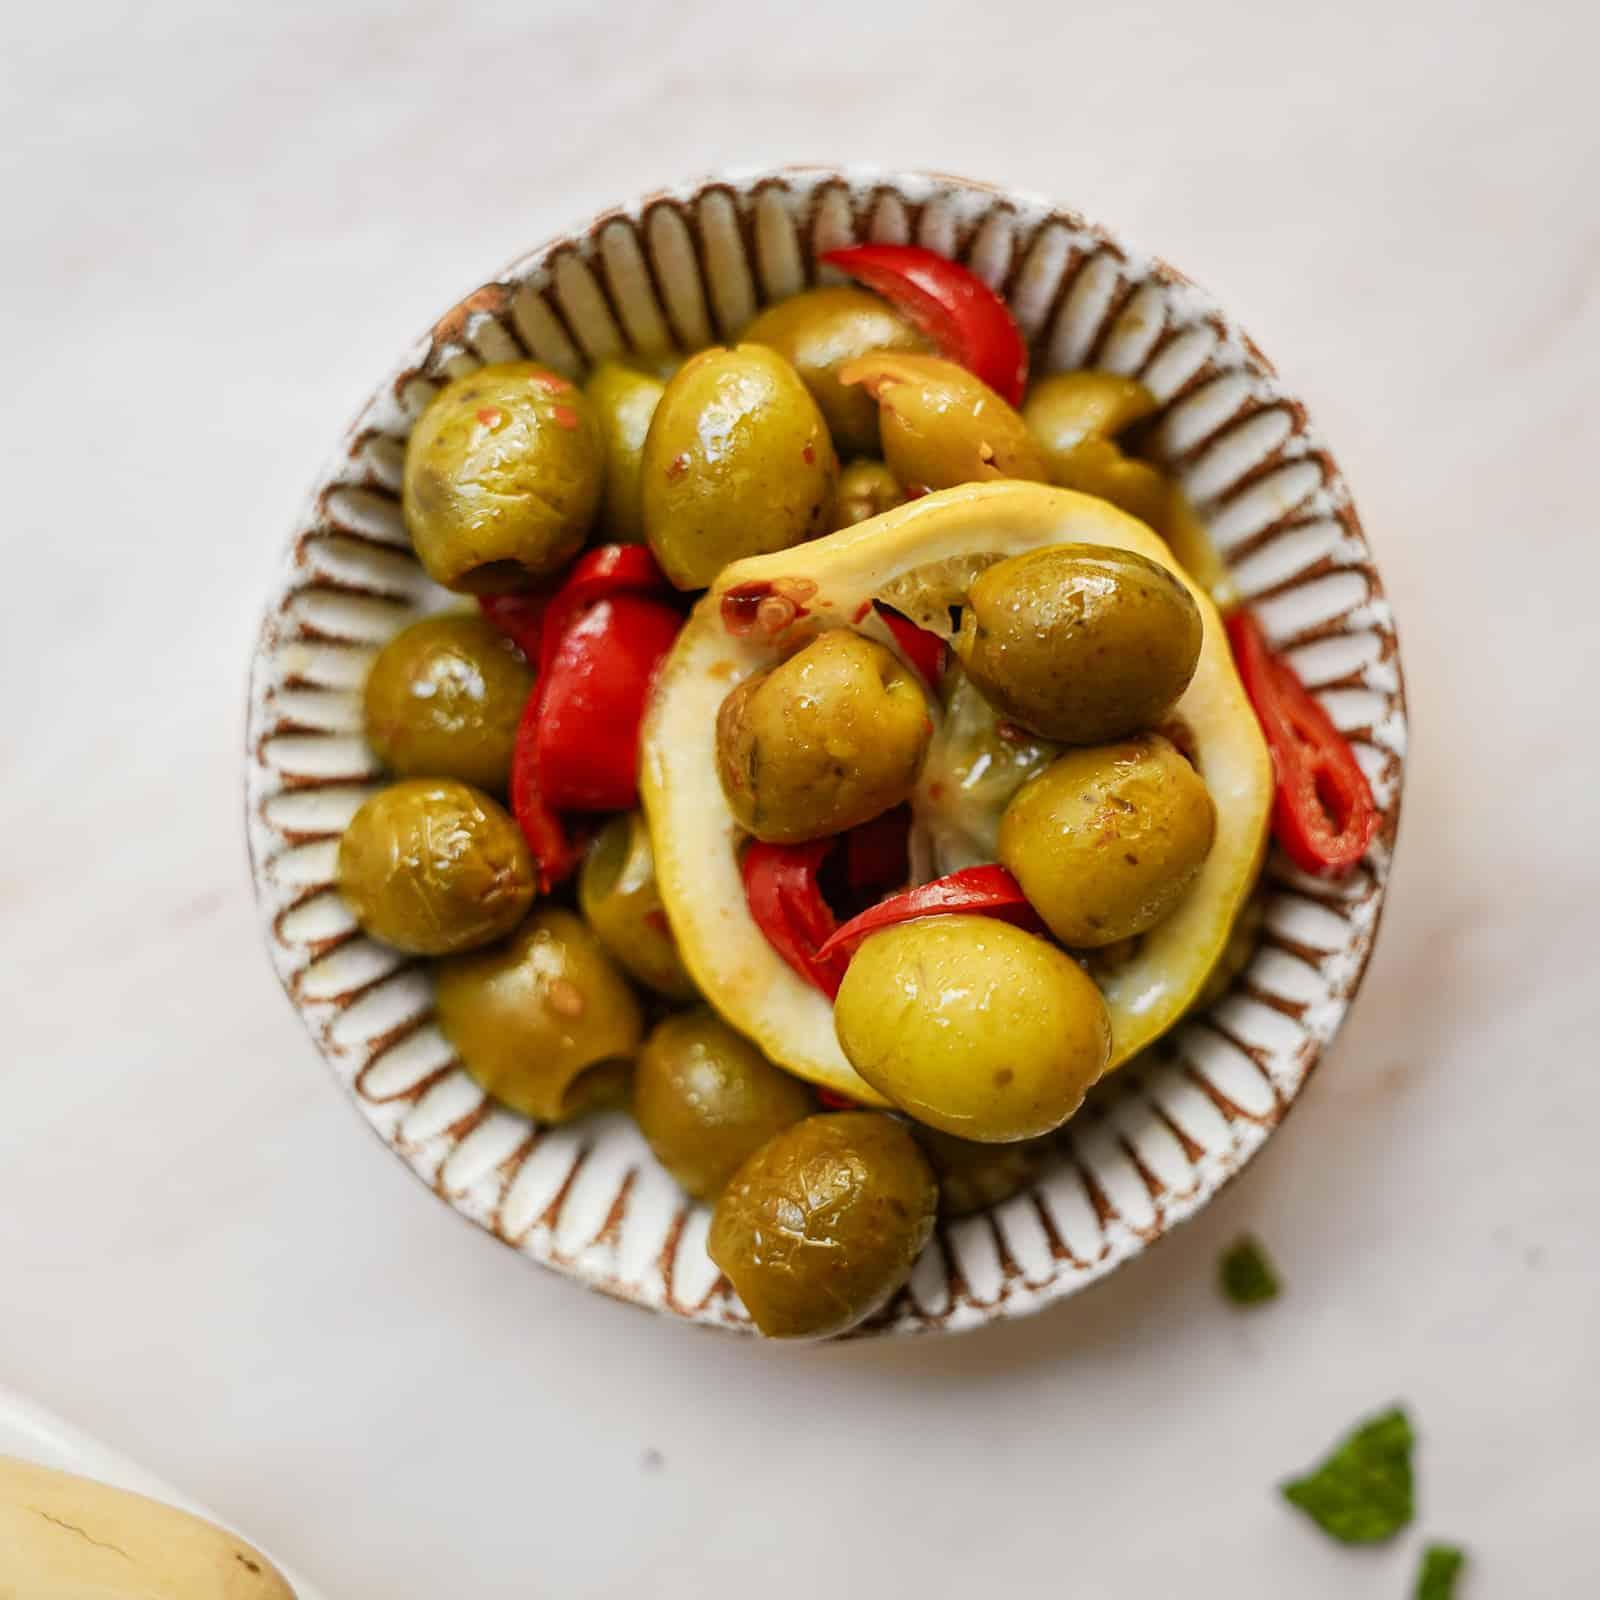 Bowl of fresh green olives